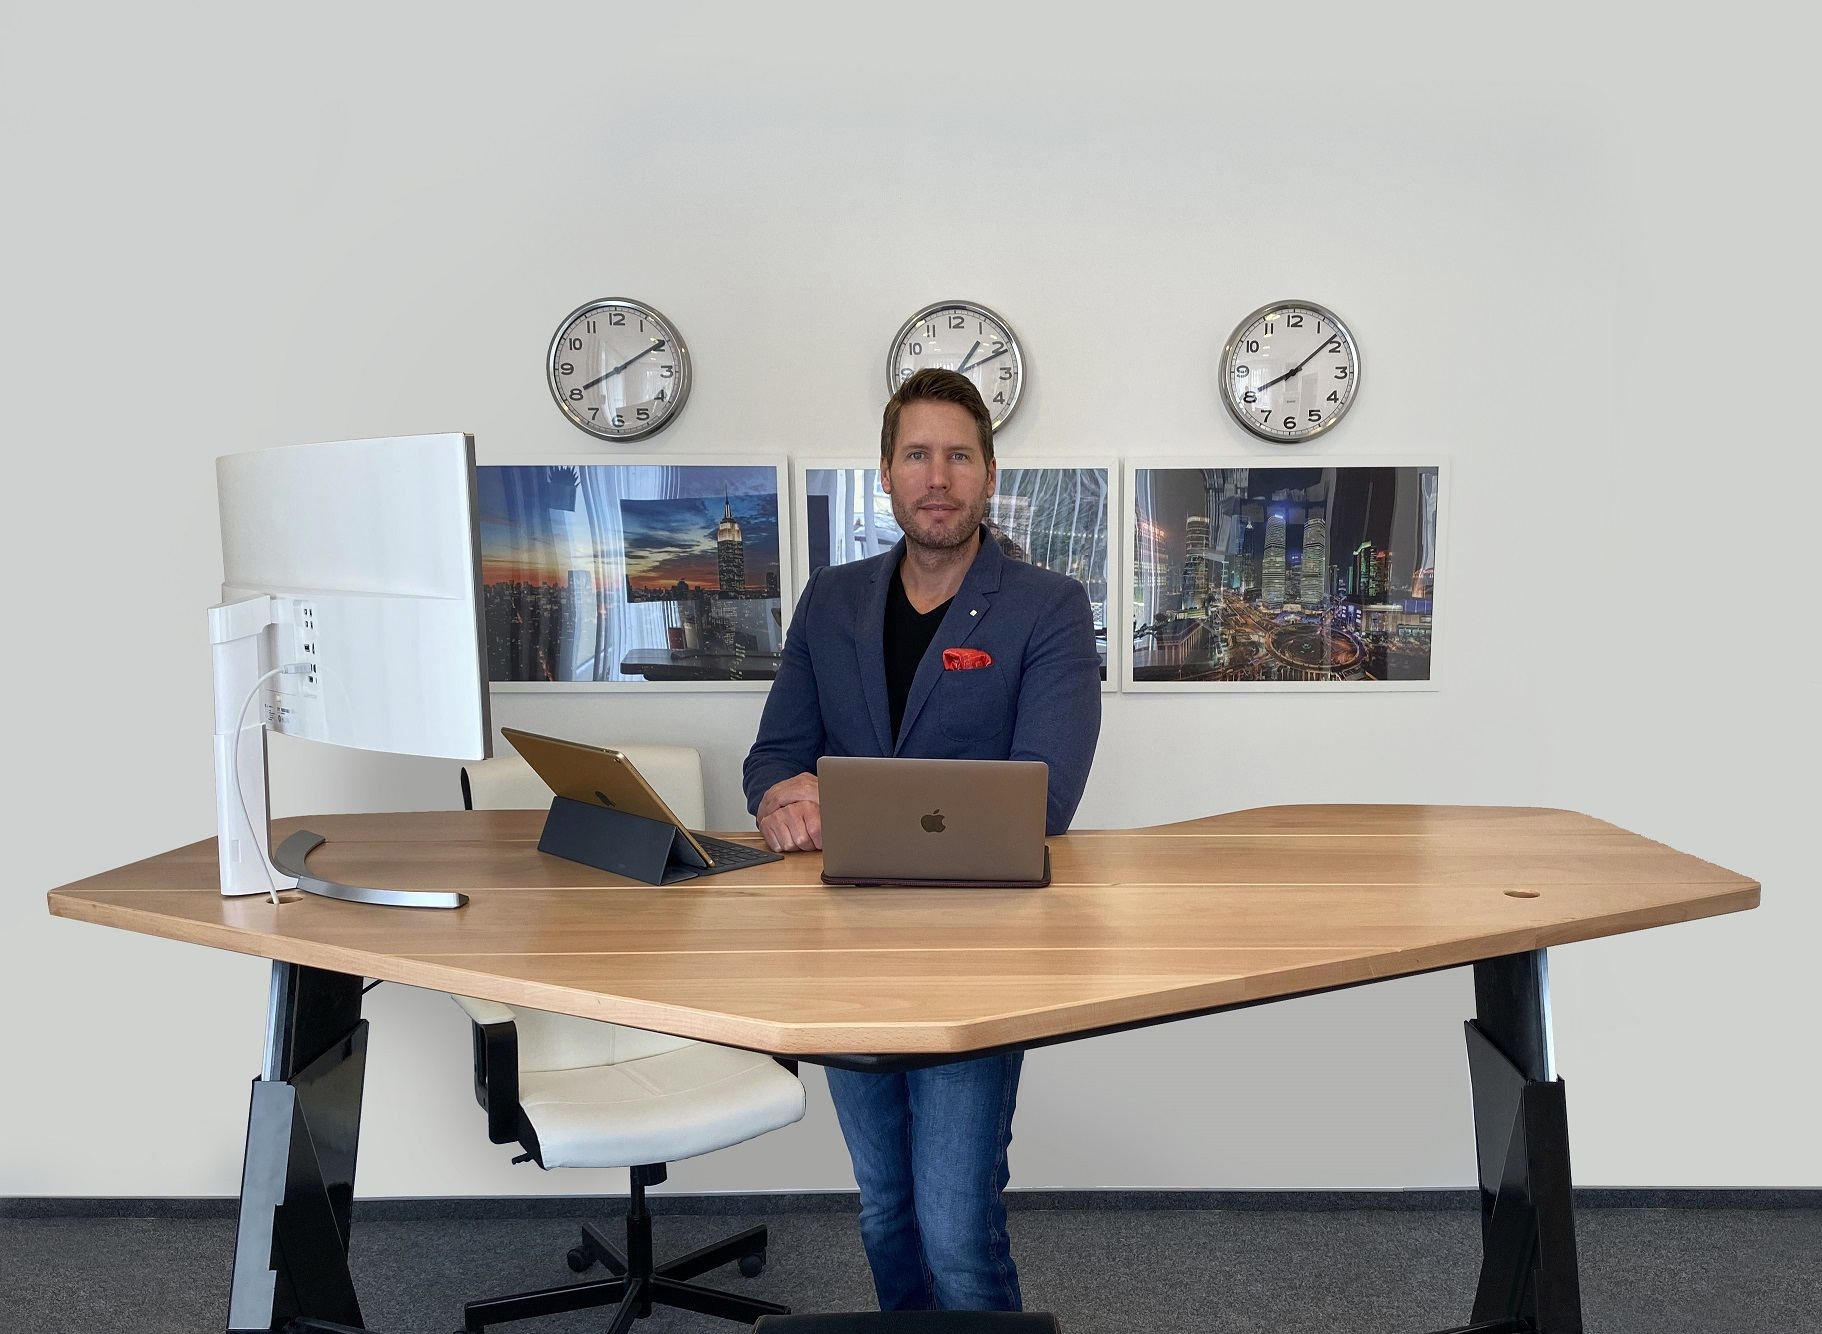 ait_desks_dr_marczali_tamas_phantom1_office_small.jpg